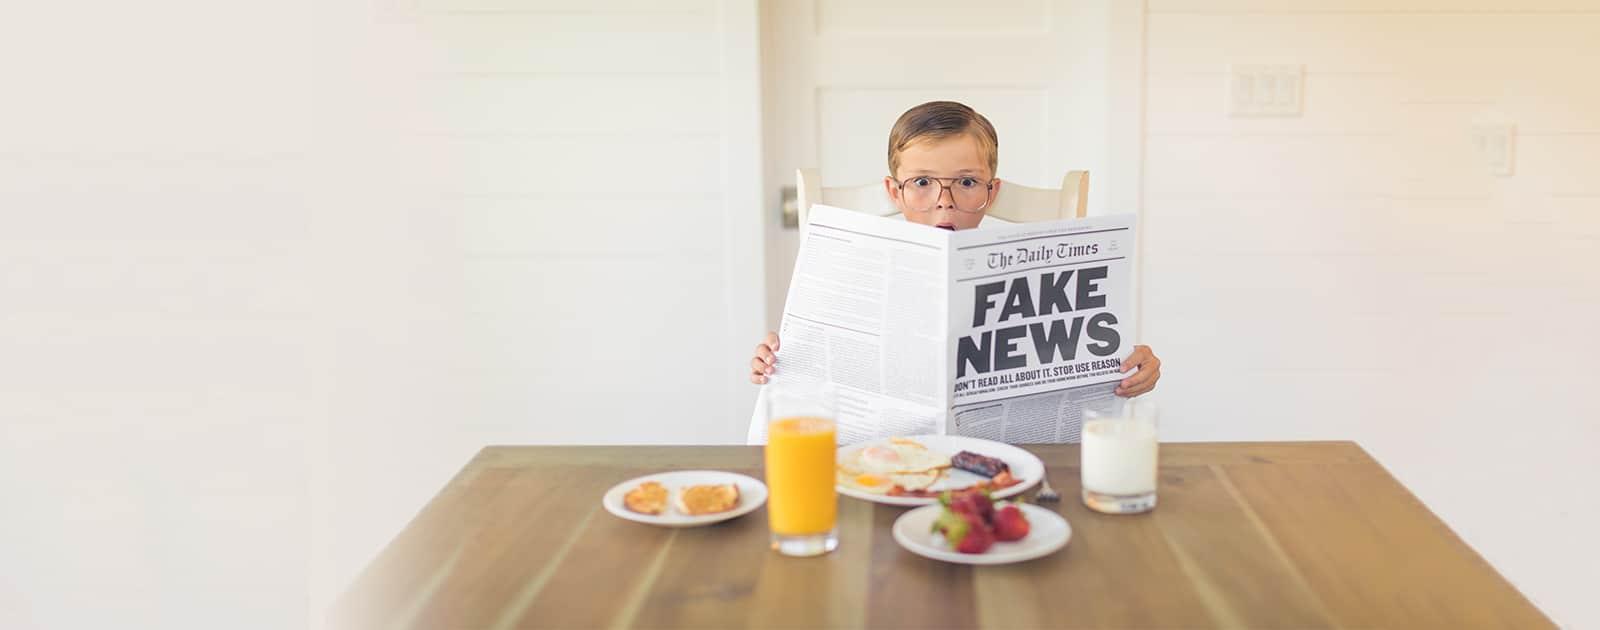 Décrypte les «Fake news»